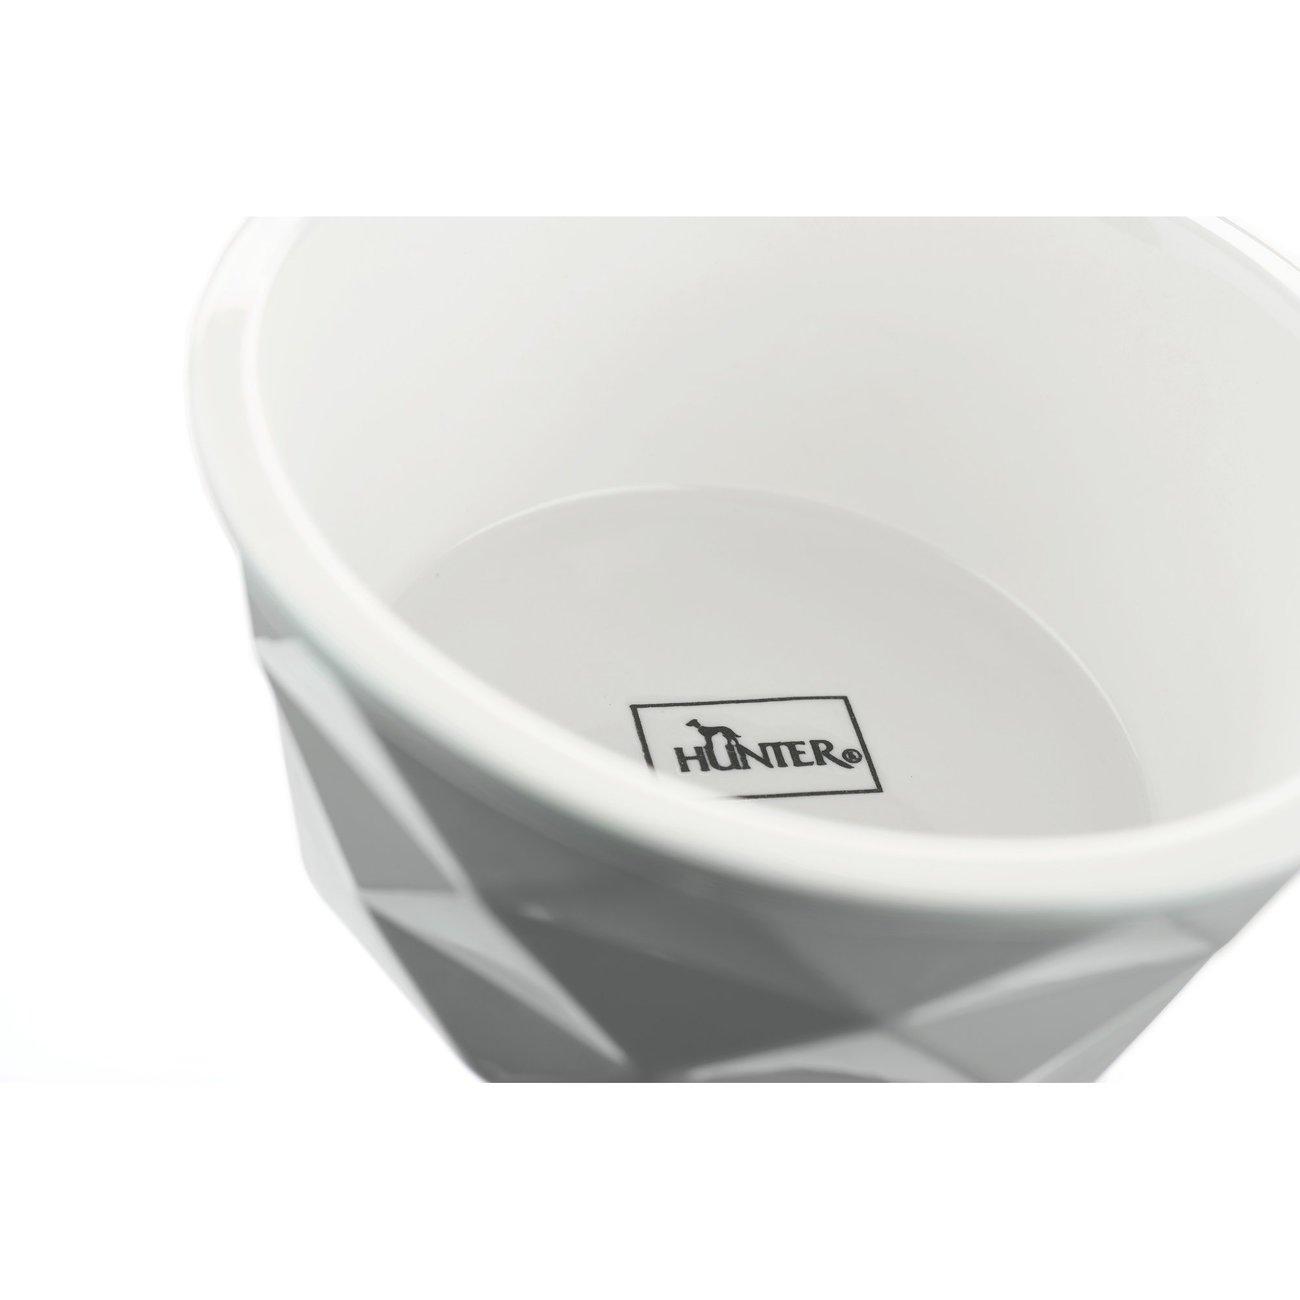 Hunter Keramik Napf Eiby 68648, Bild 9